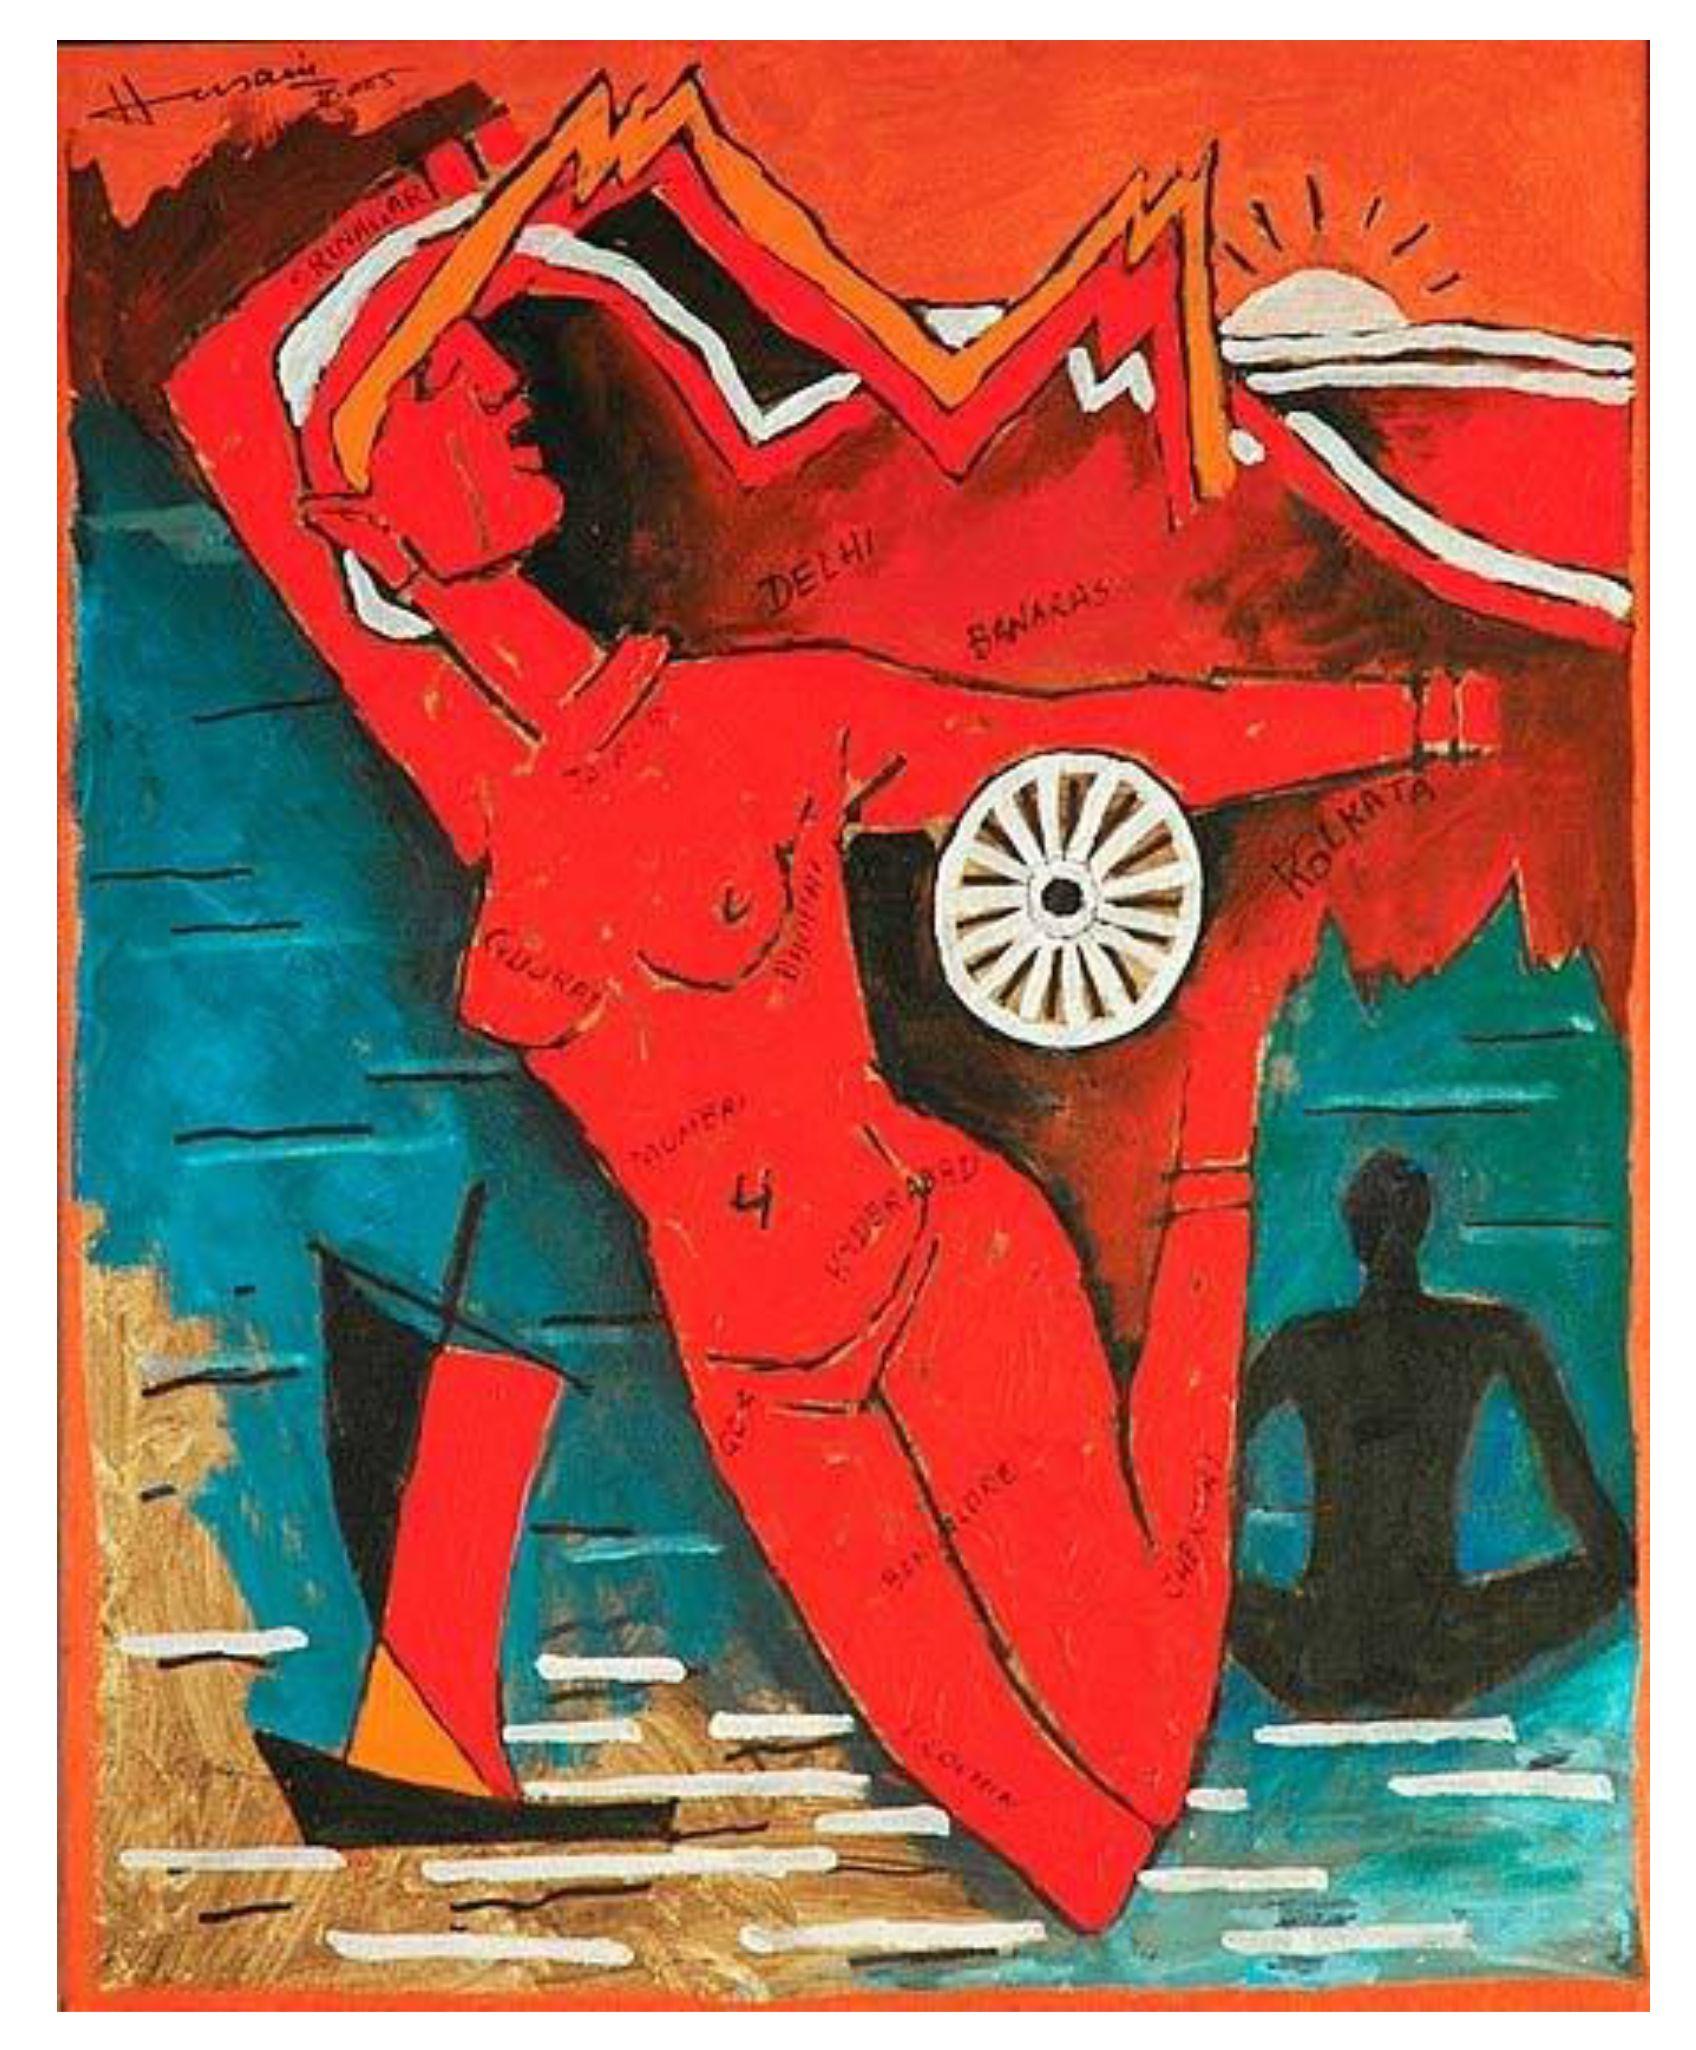 'Bharat Mata' by M.F. Hussein